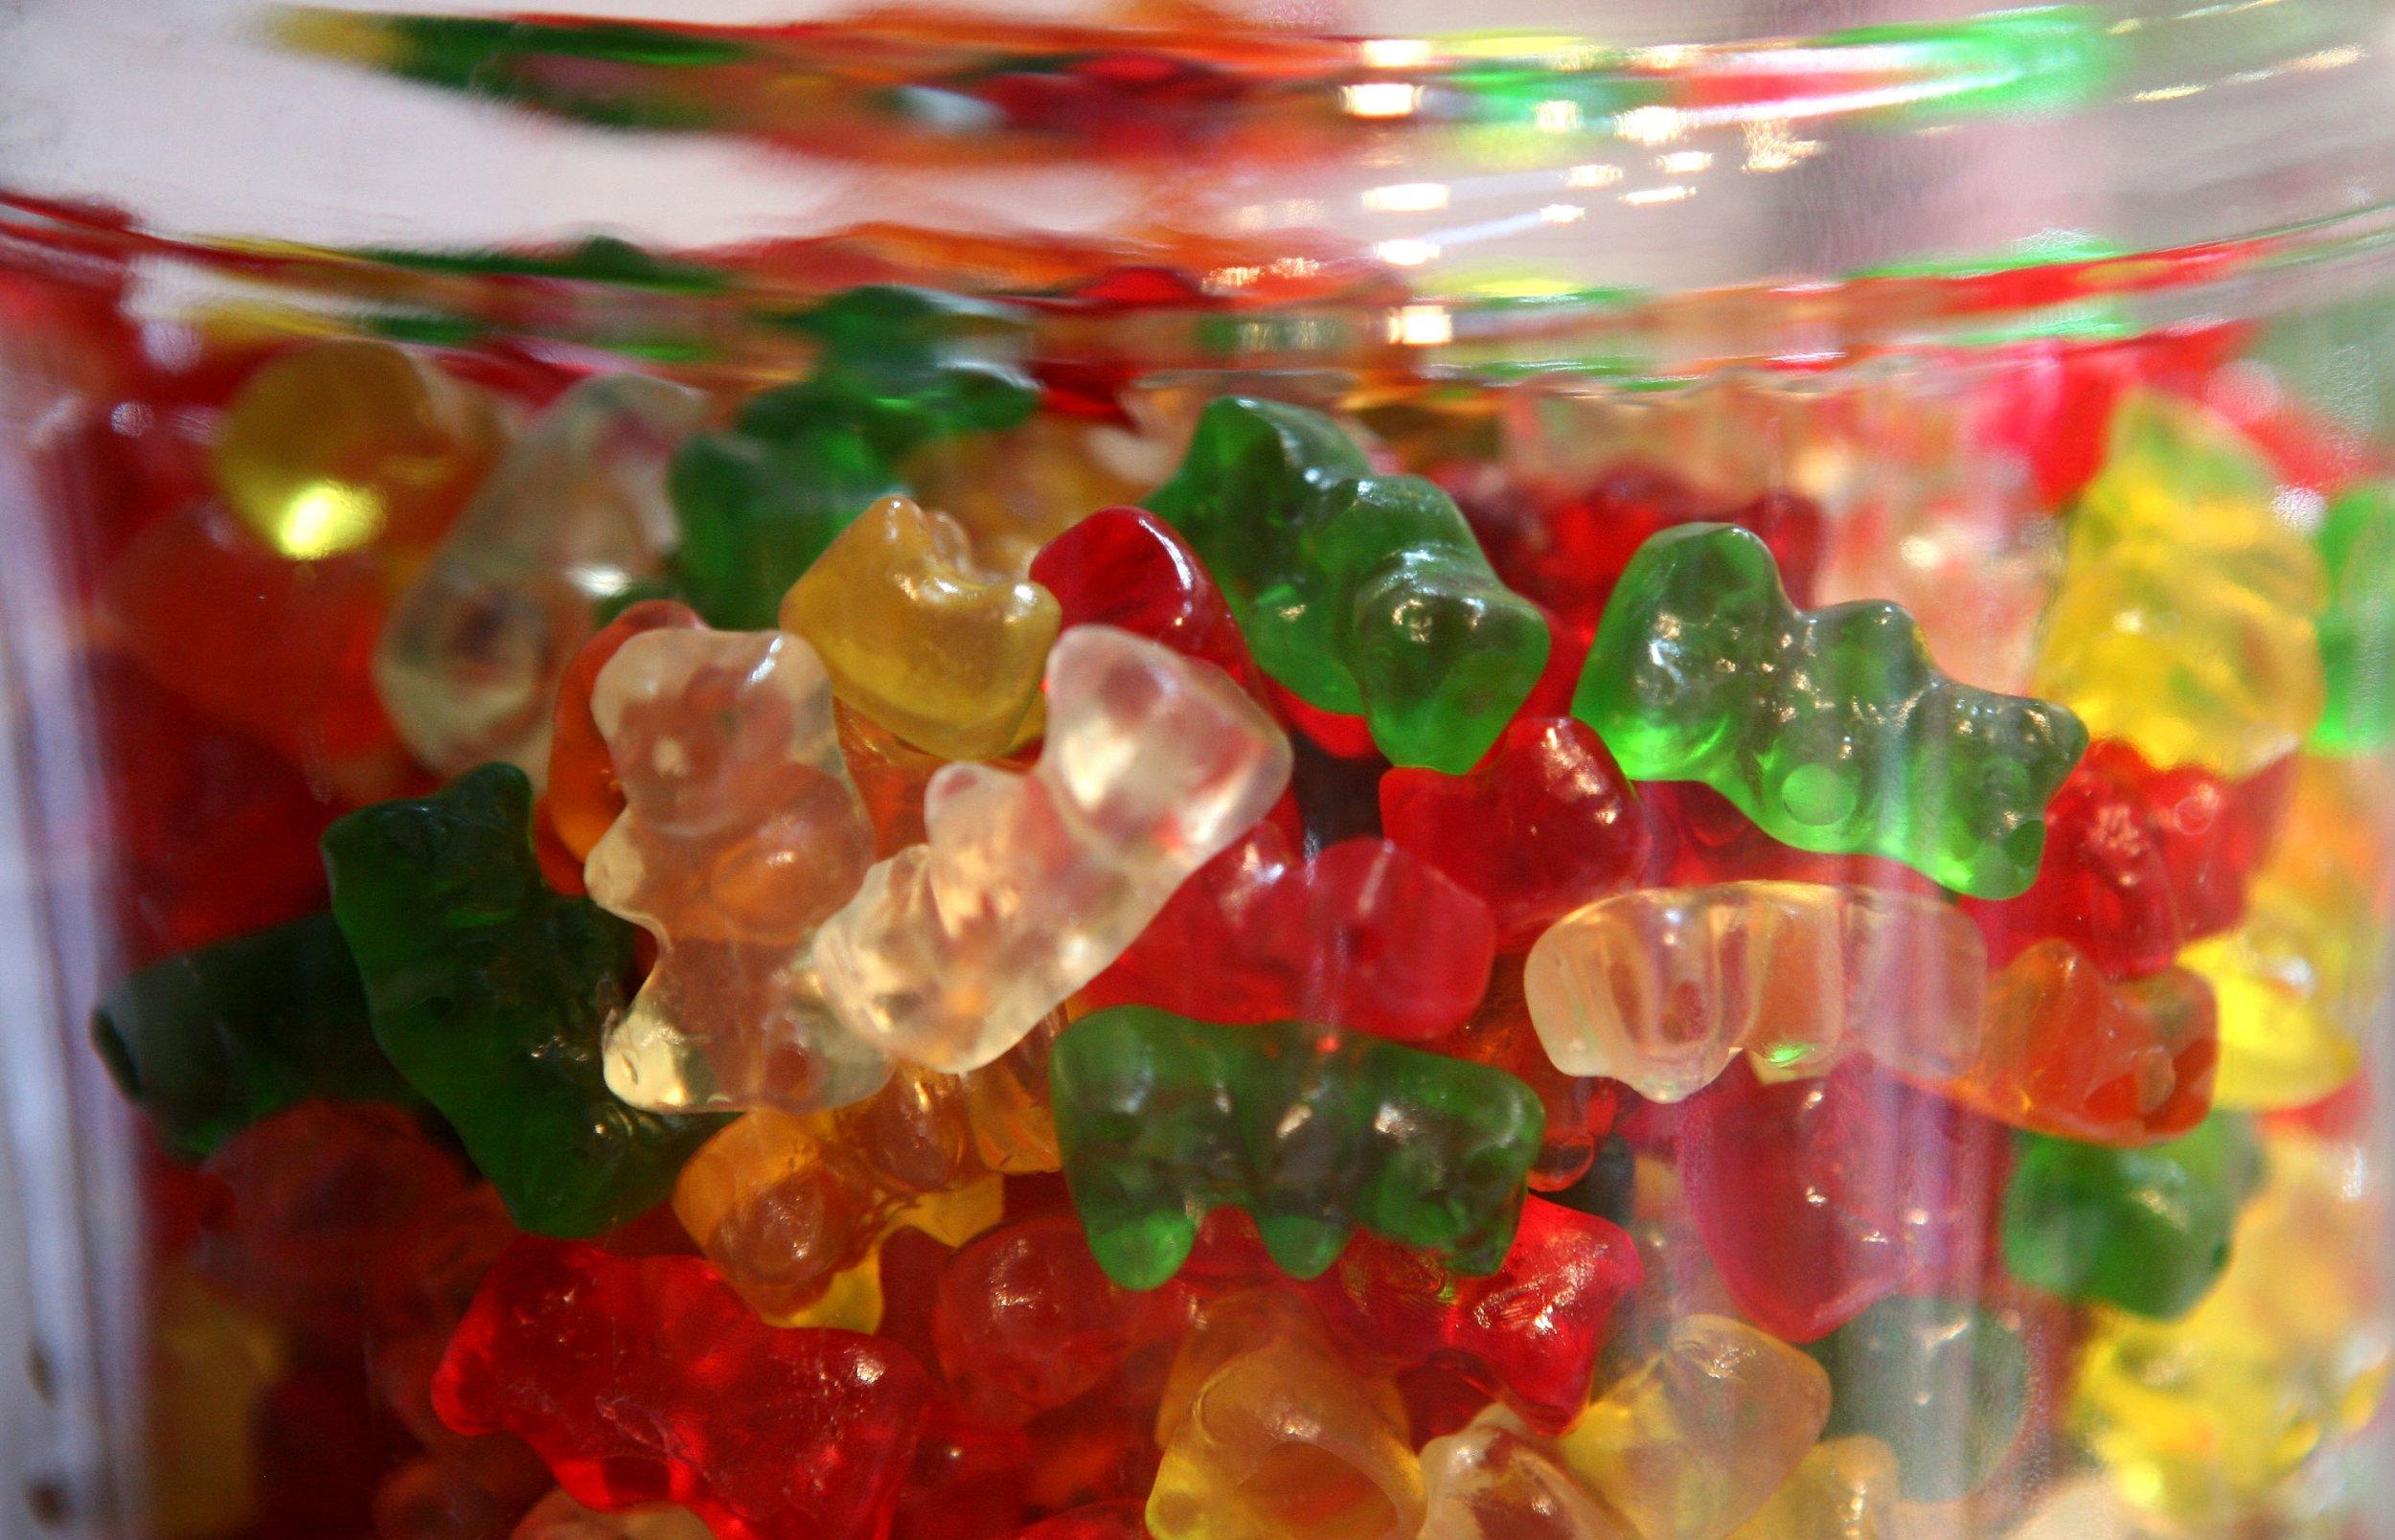 bears bears bears bears bears bears bears bears